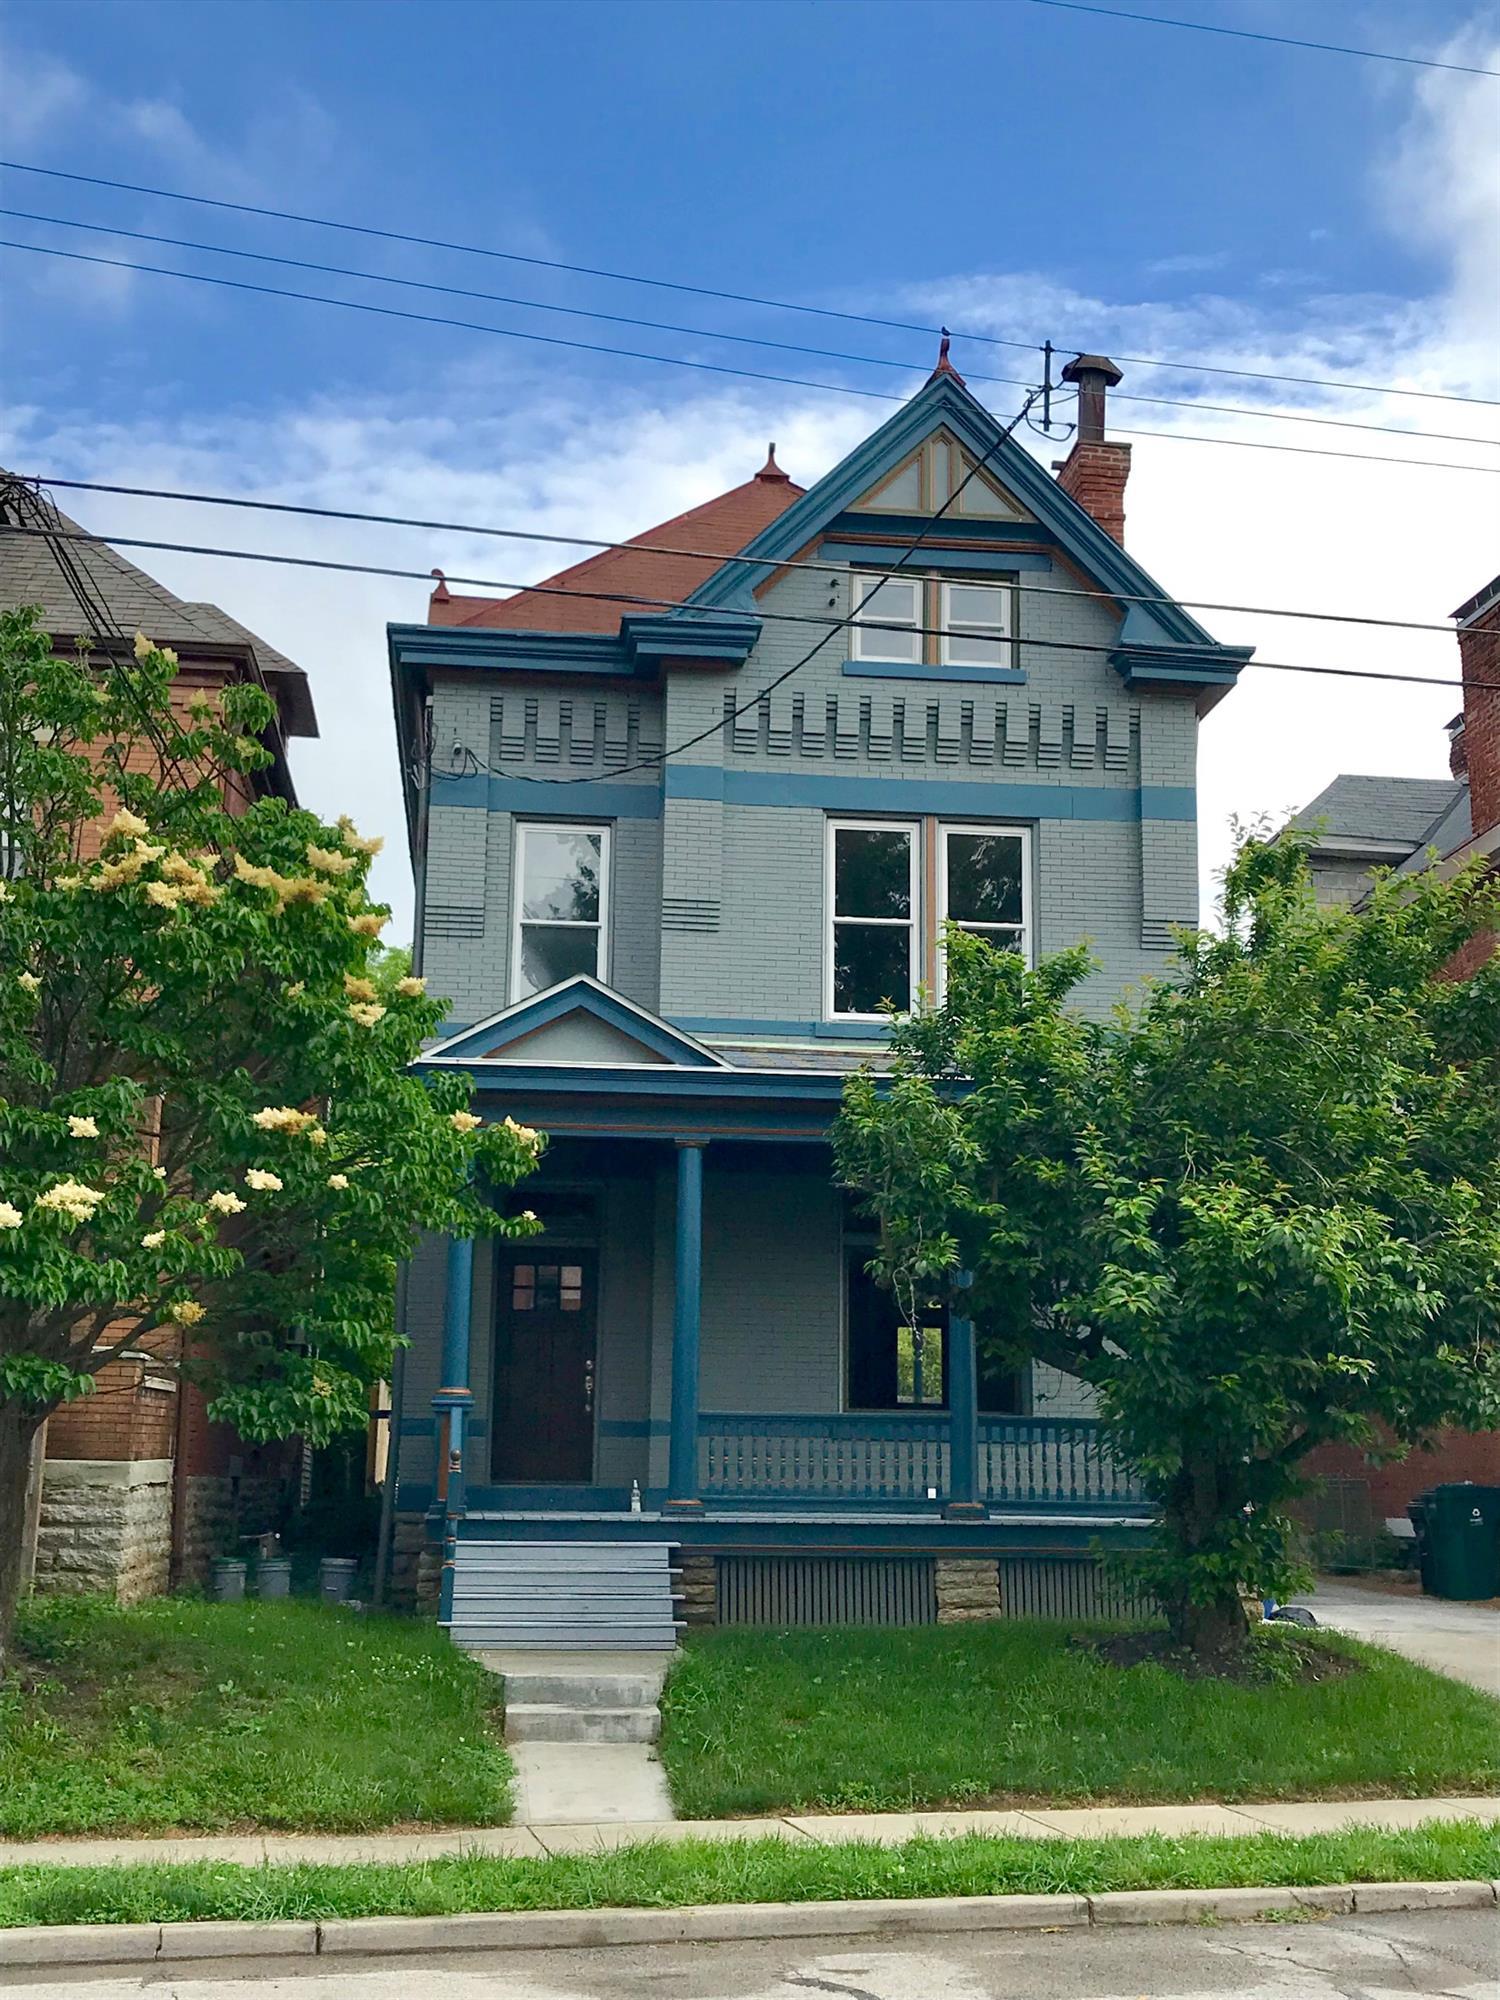 1532 Pullan Ave Northside, OH